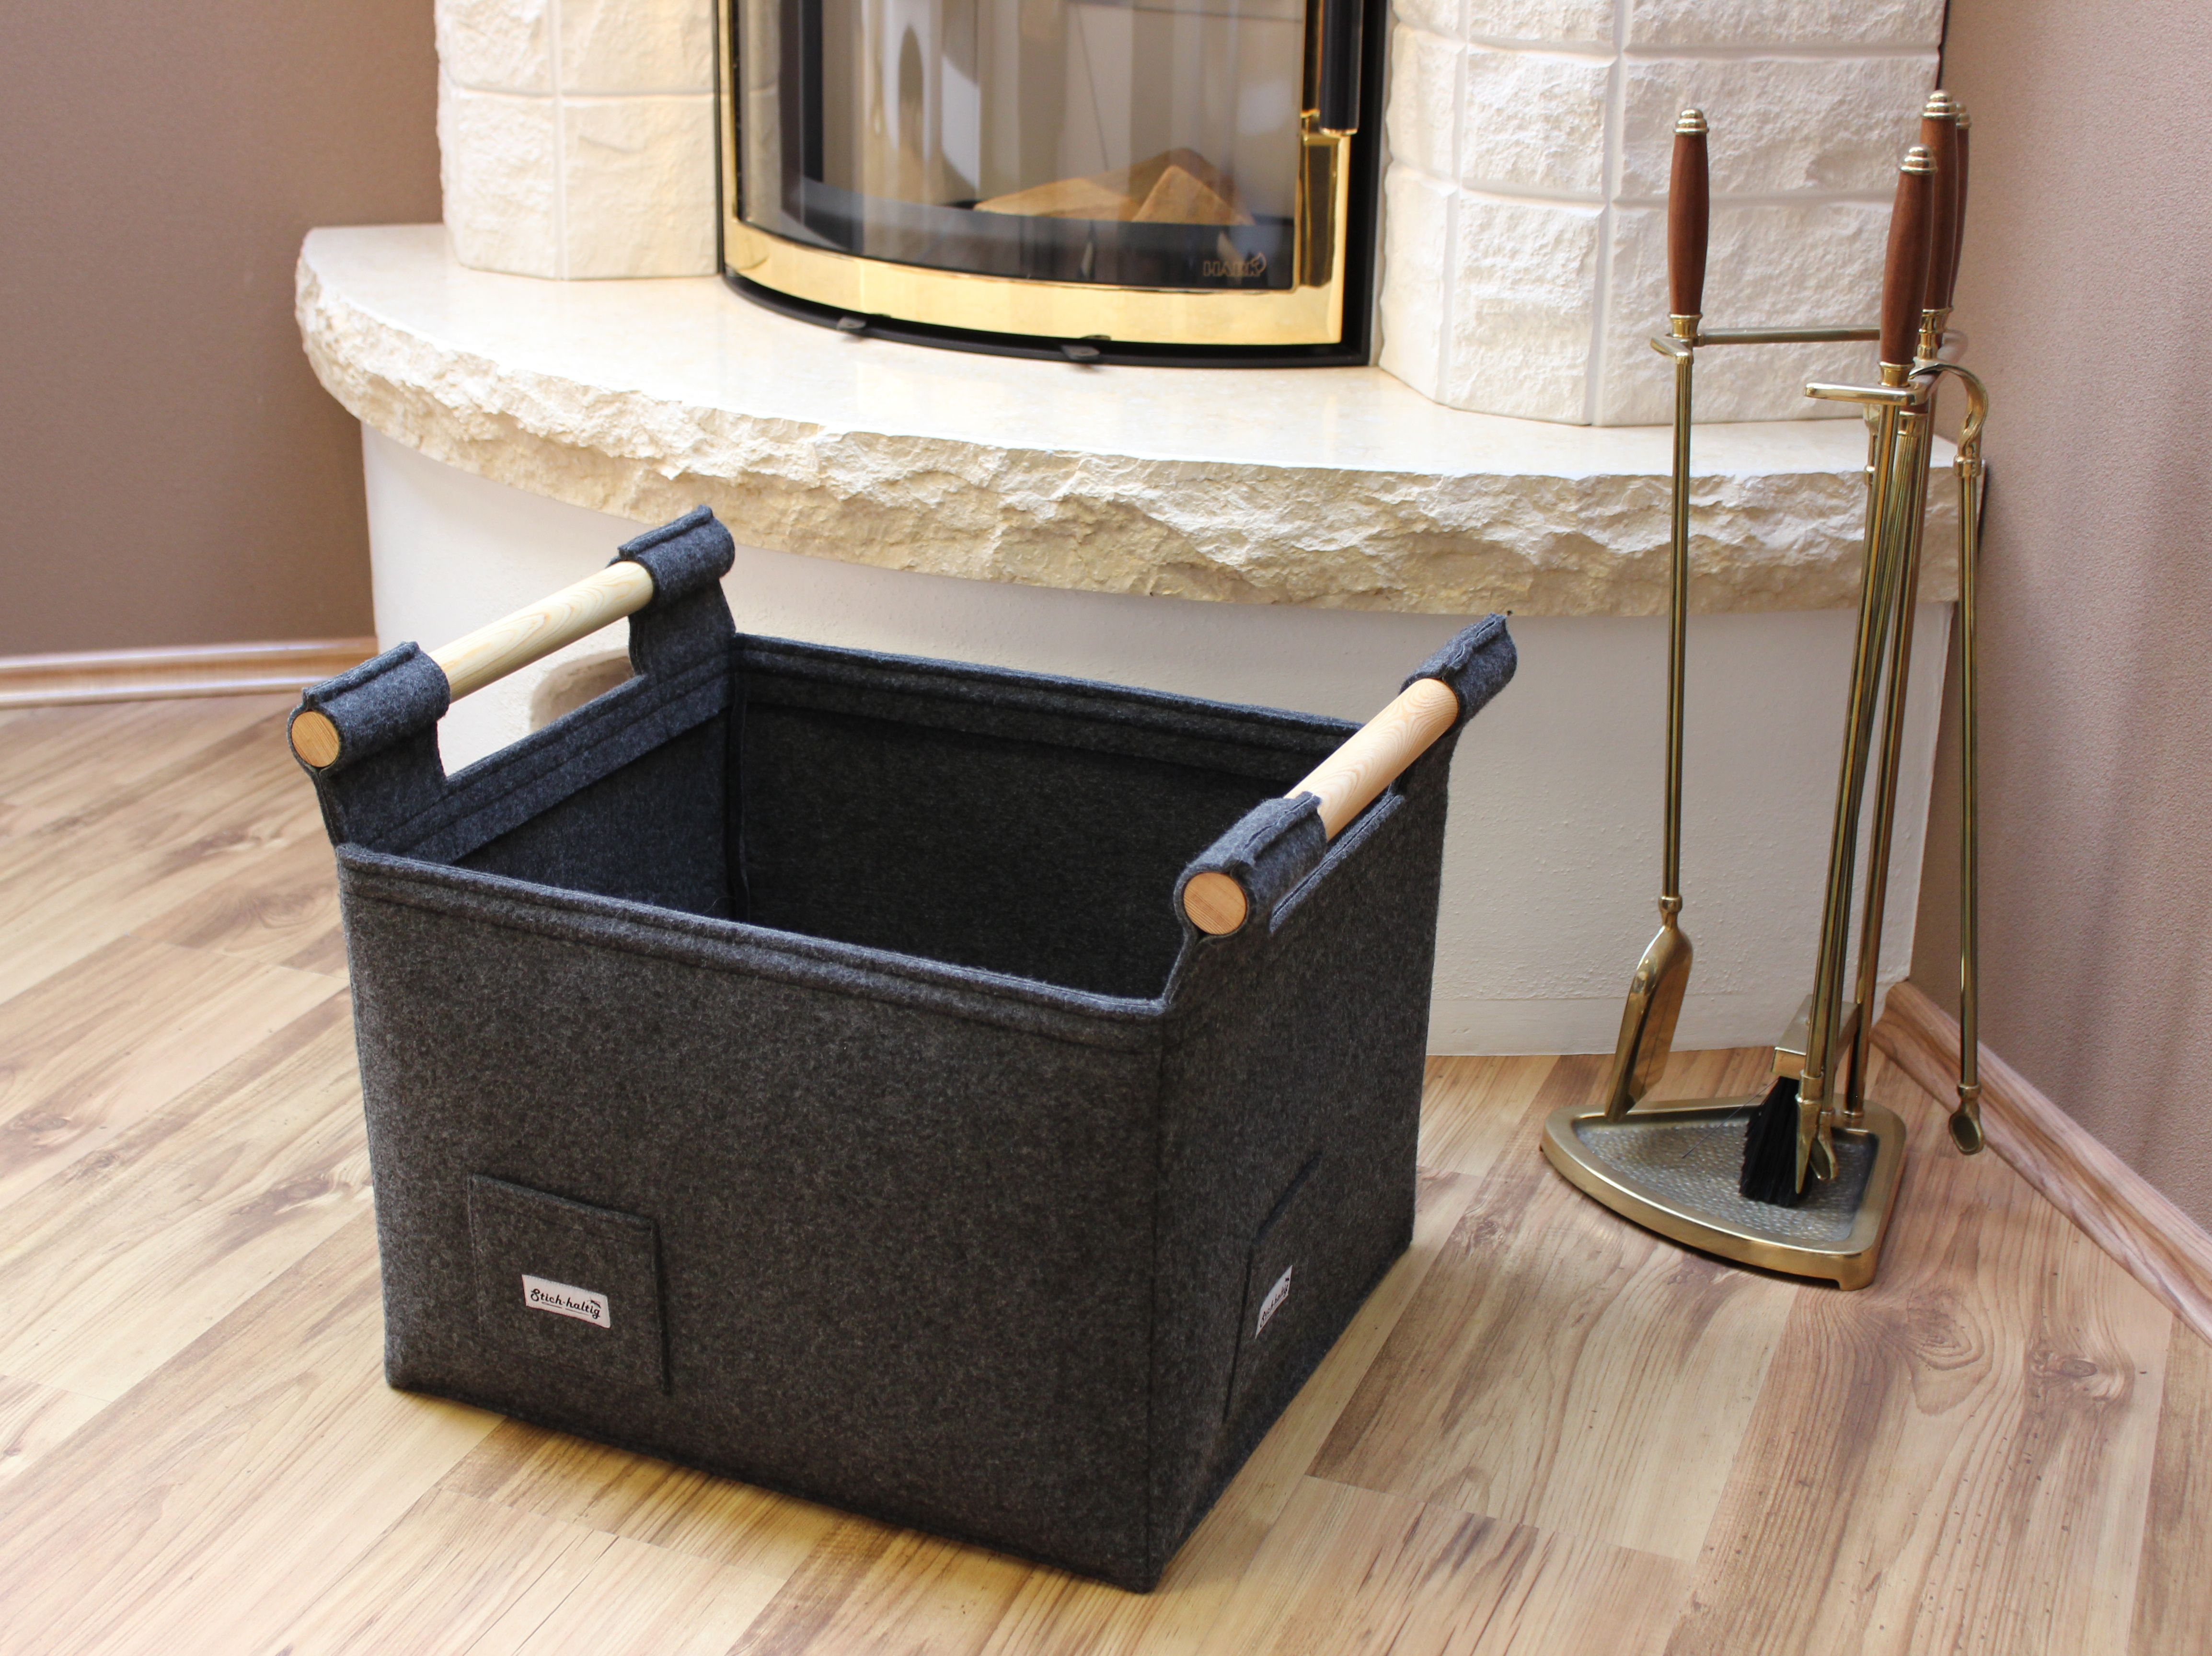 designer kaminholzkorb aus filz f r deinen kamin kamin. Black Bedroom Furniture Sets. Home Design Ideas